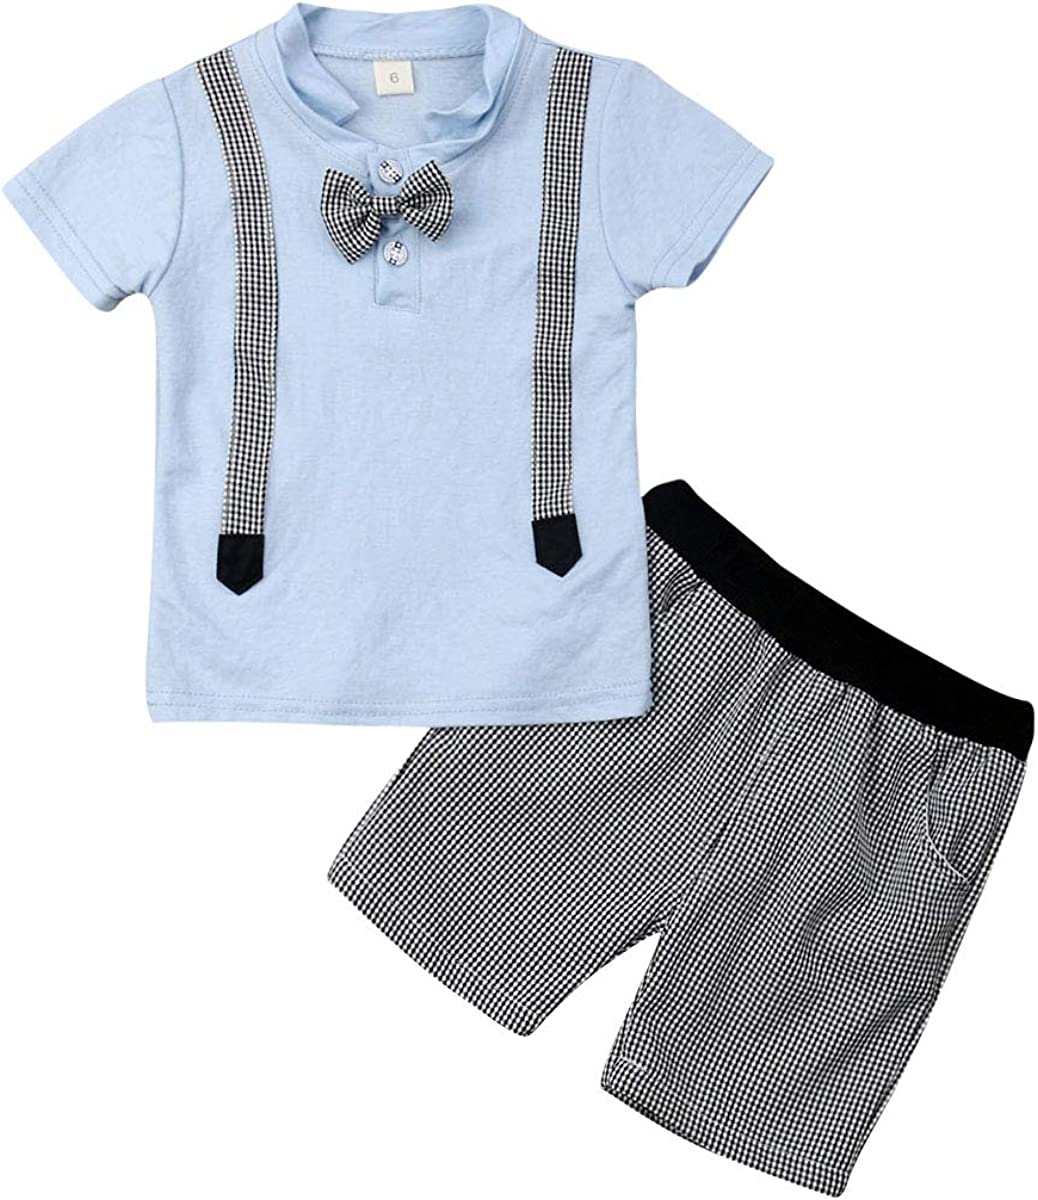 Boys Clothing Toddlers 2Pcs Set Summer New Fashion 100/% Cotton Star 1 2 3 yrs